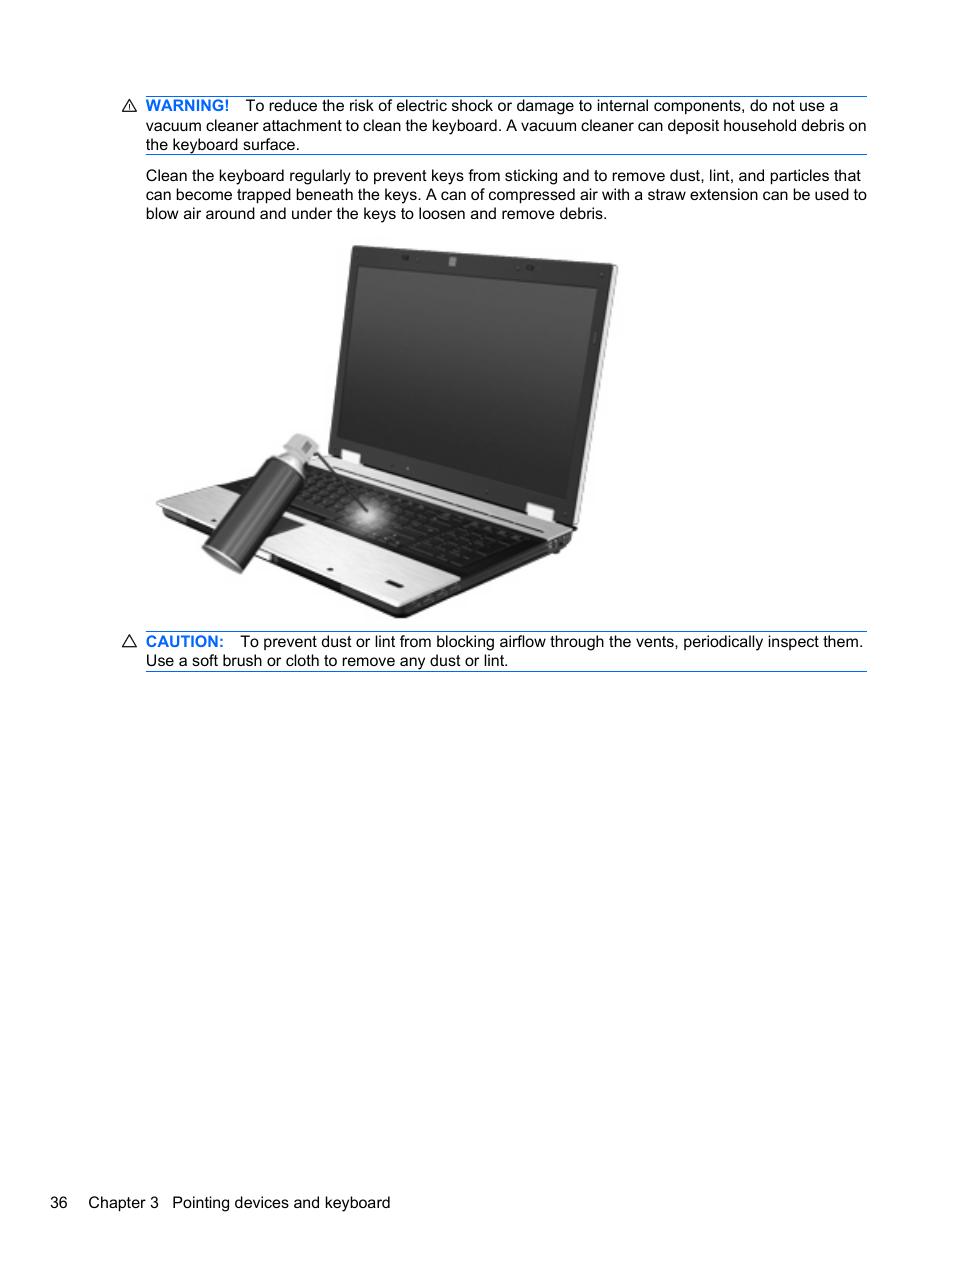 hp elitebook 8740w mobile workstation user manual page 48 150 rh manualsdir com  hp elitebook 8740w service manual